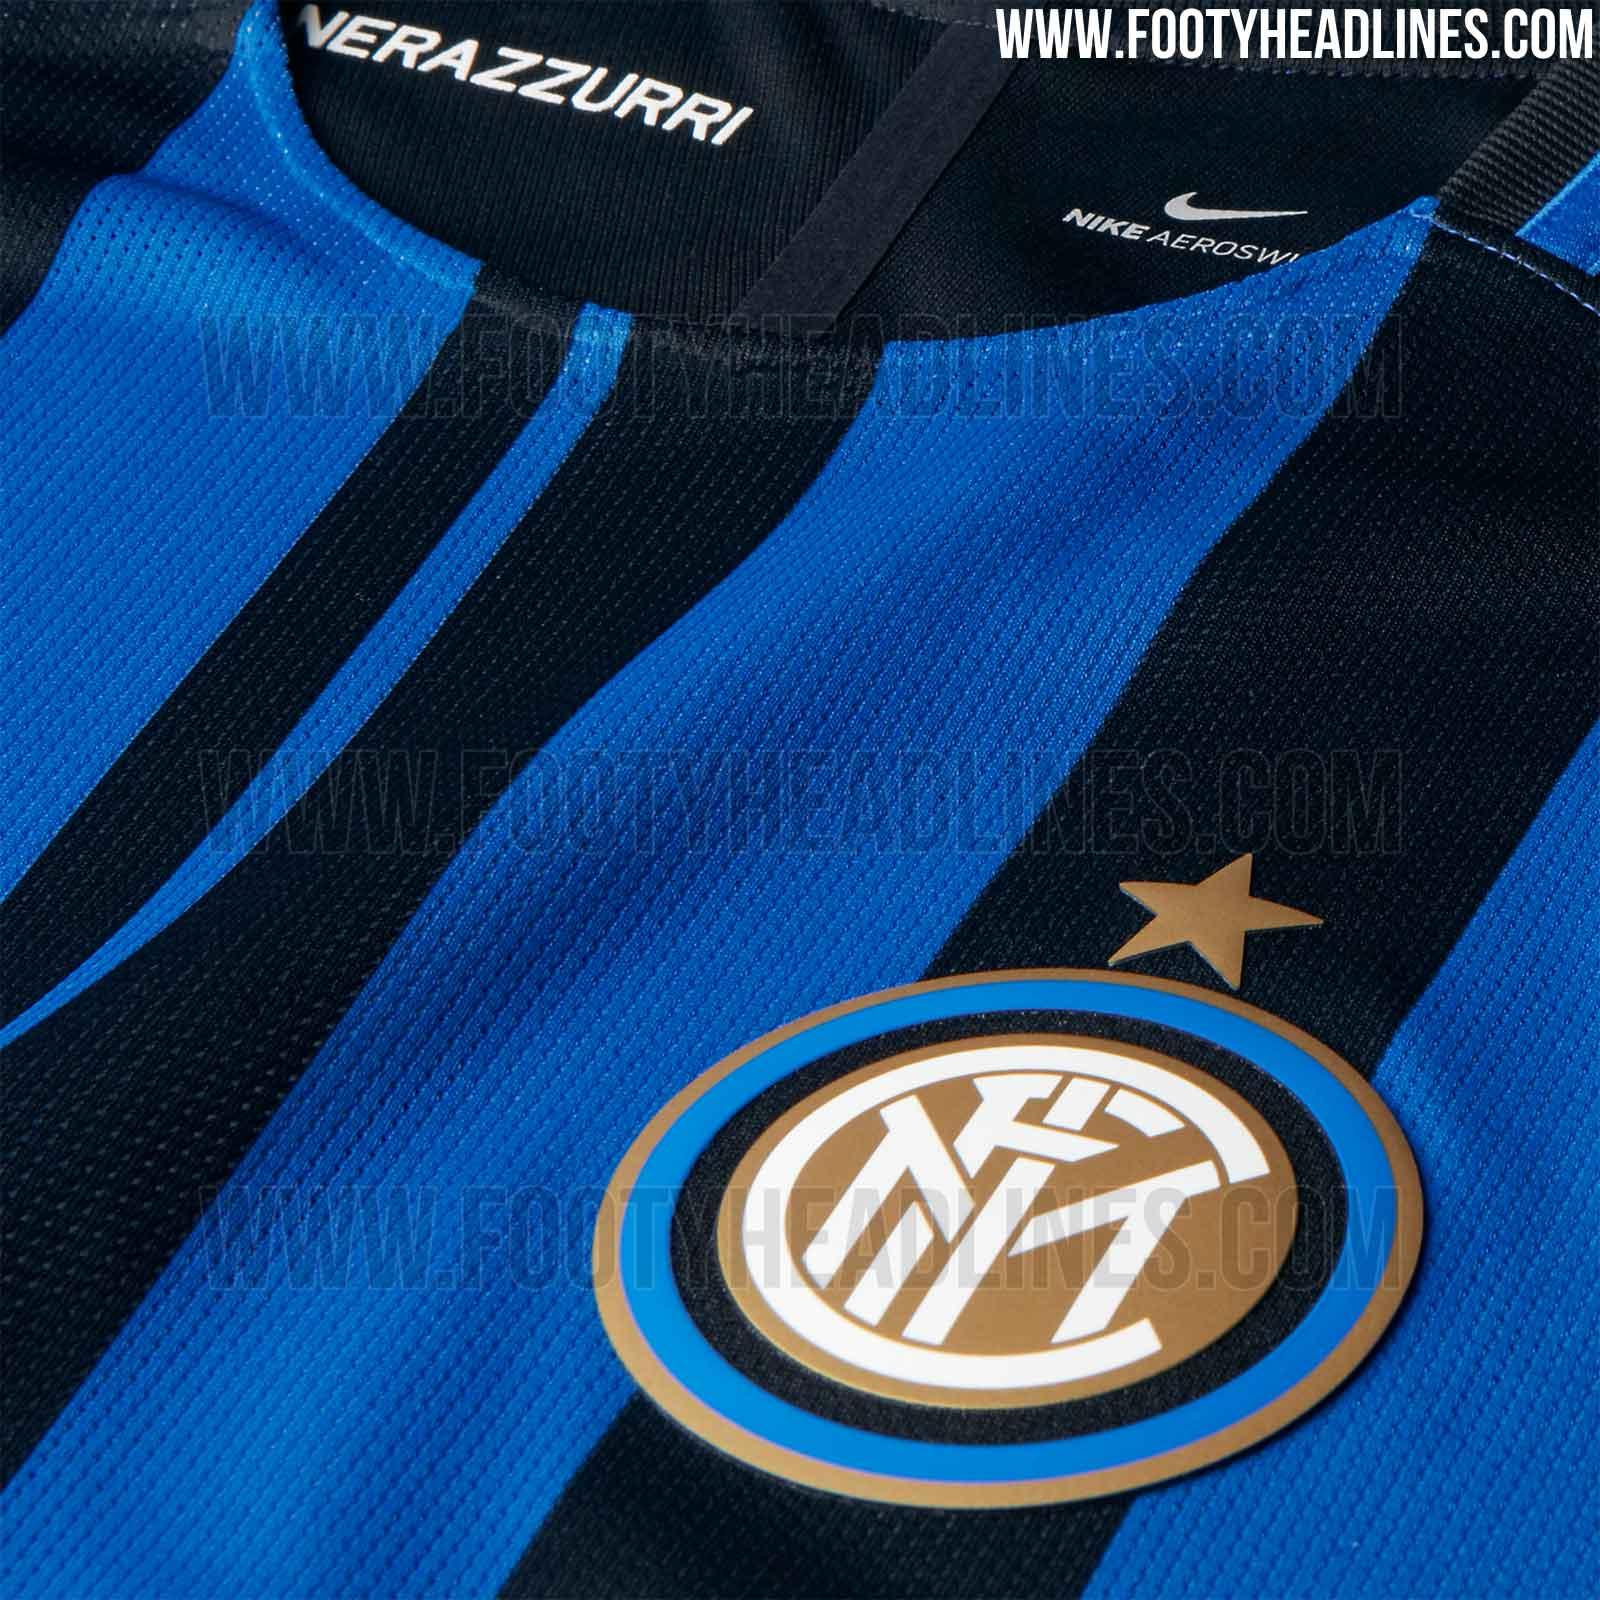 Inter Milan 17-18 Home Kit Released